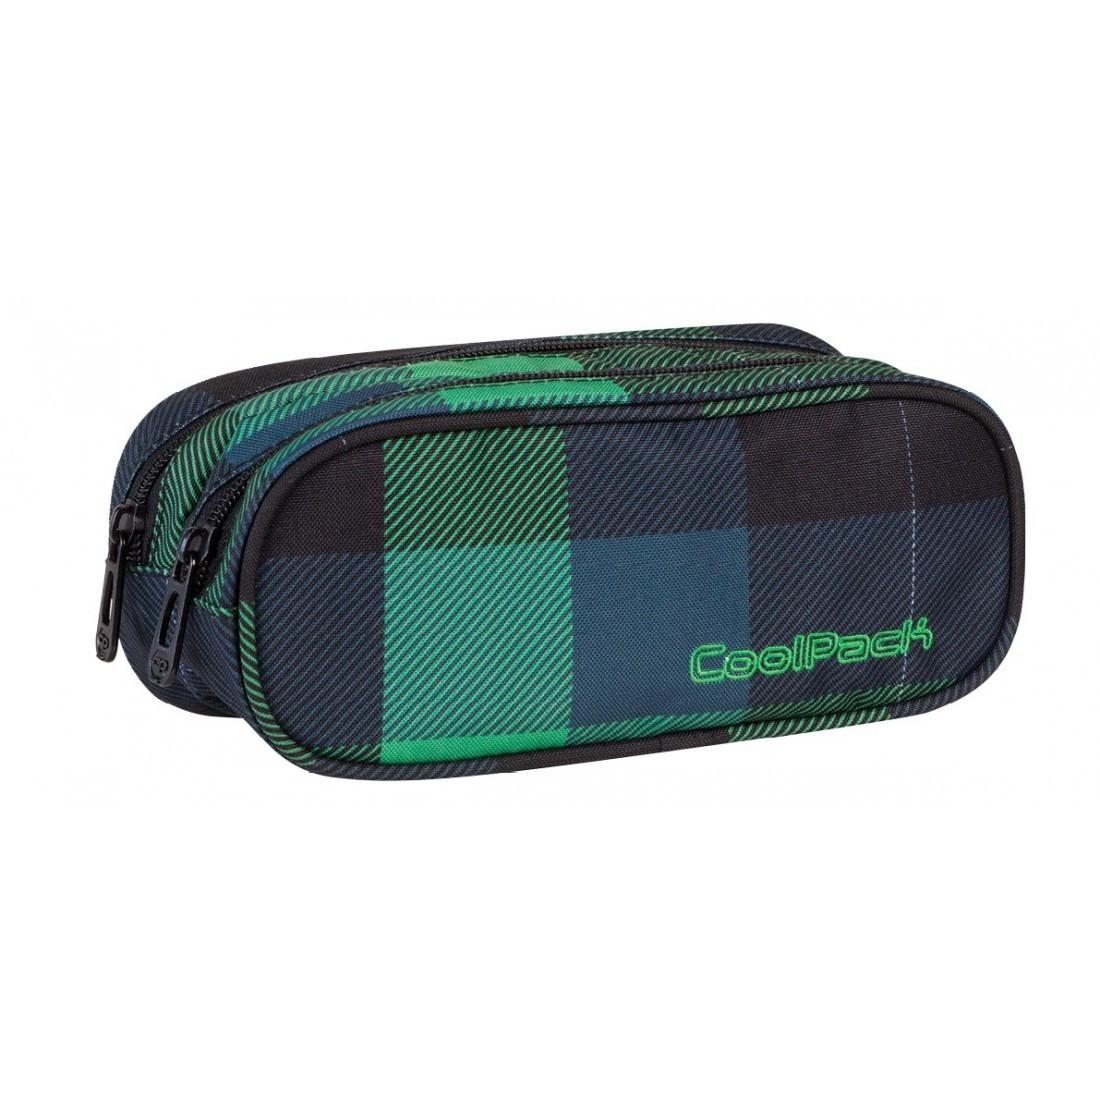 Saszetka podwójna CoolPack CLEVER OXFORD CP 495 - plecak-tornister.pl